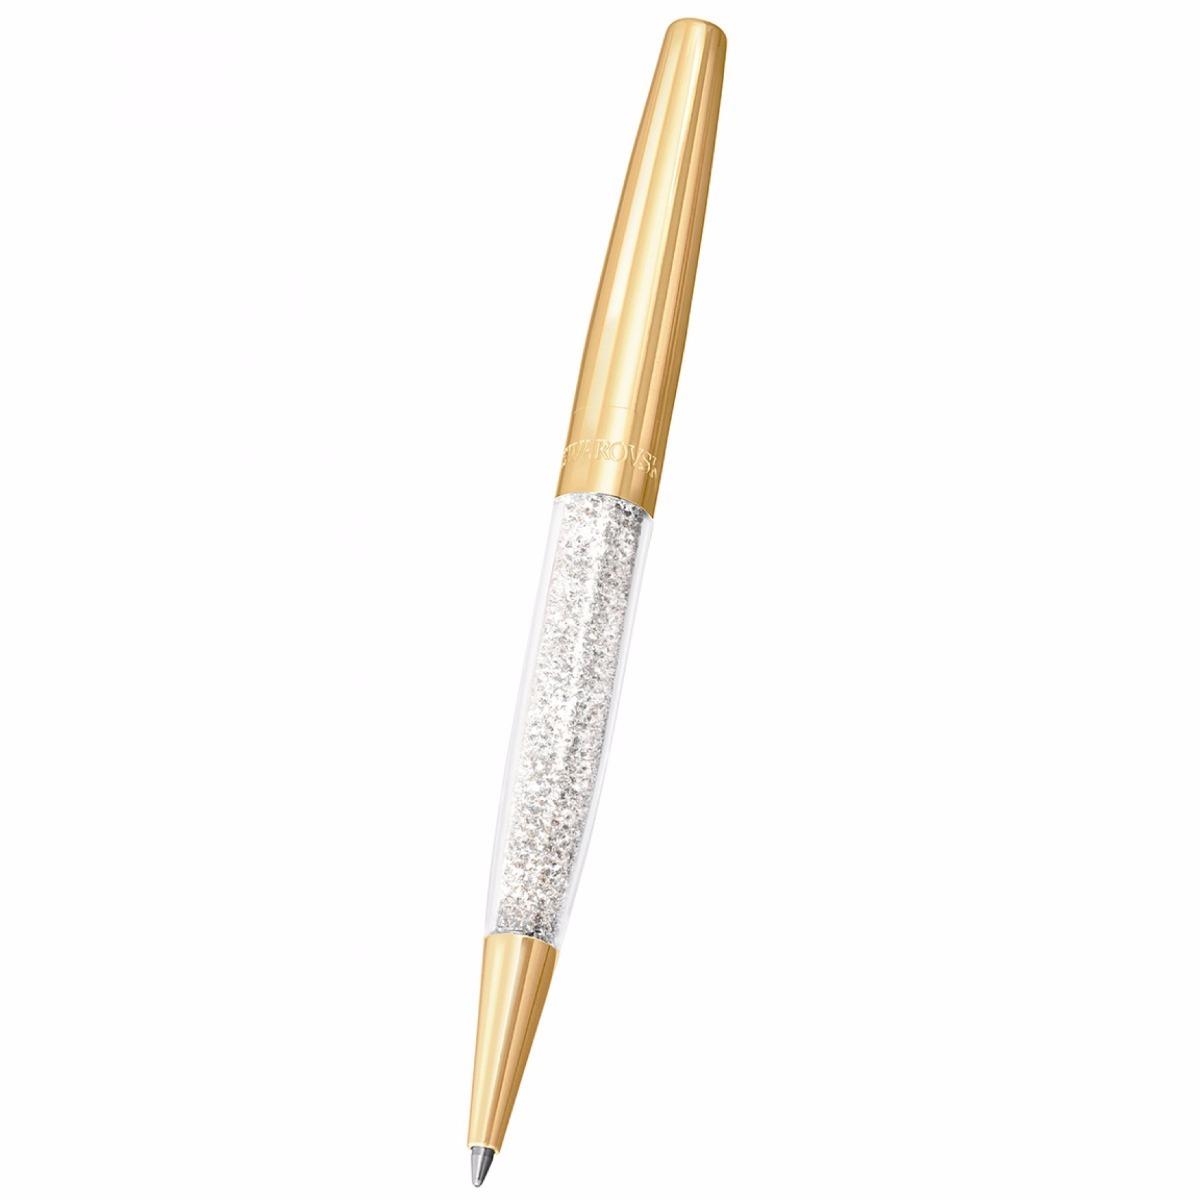 7b6afff8727a lapicero swarovski cristalino stardust pluma dorado original. Cargando zoom.